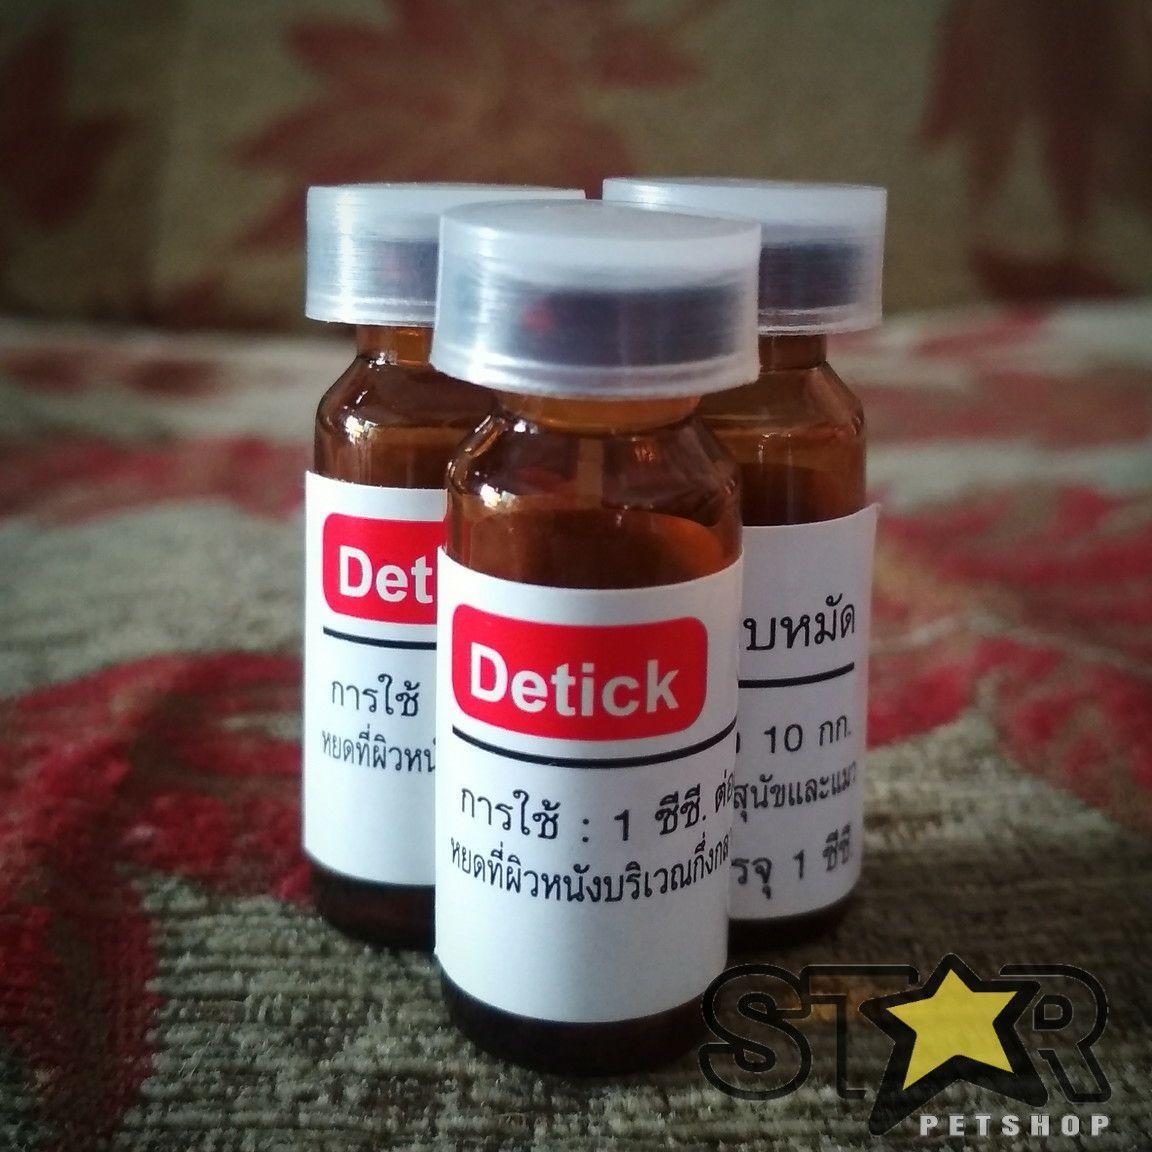 Obat Anti Kutu Kucing Detick 1-10kg By Bukitagung.